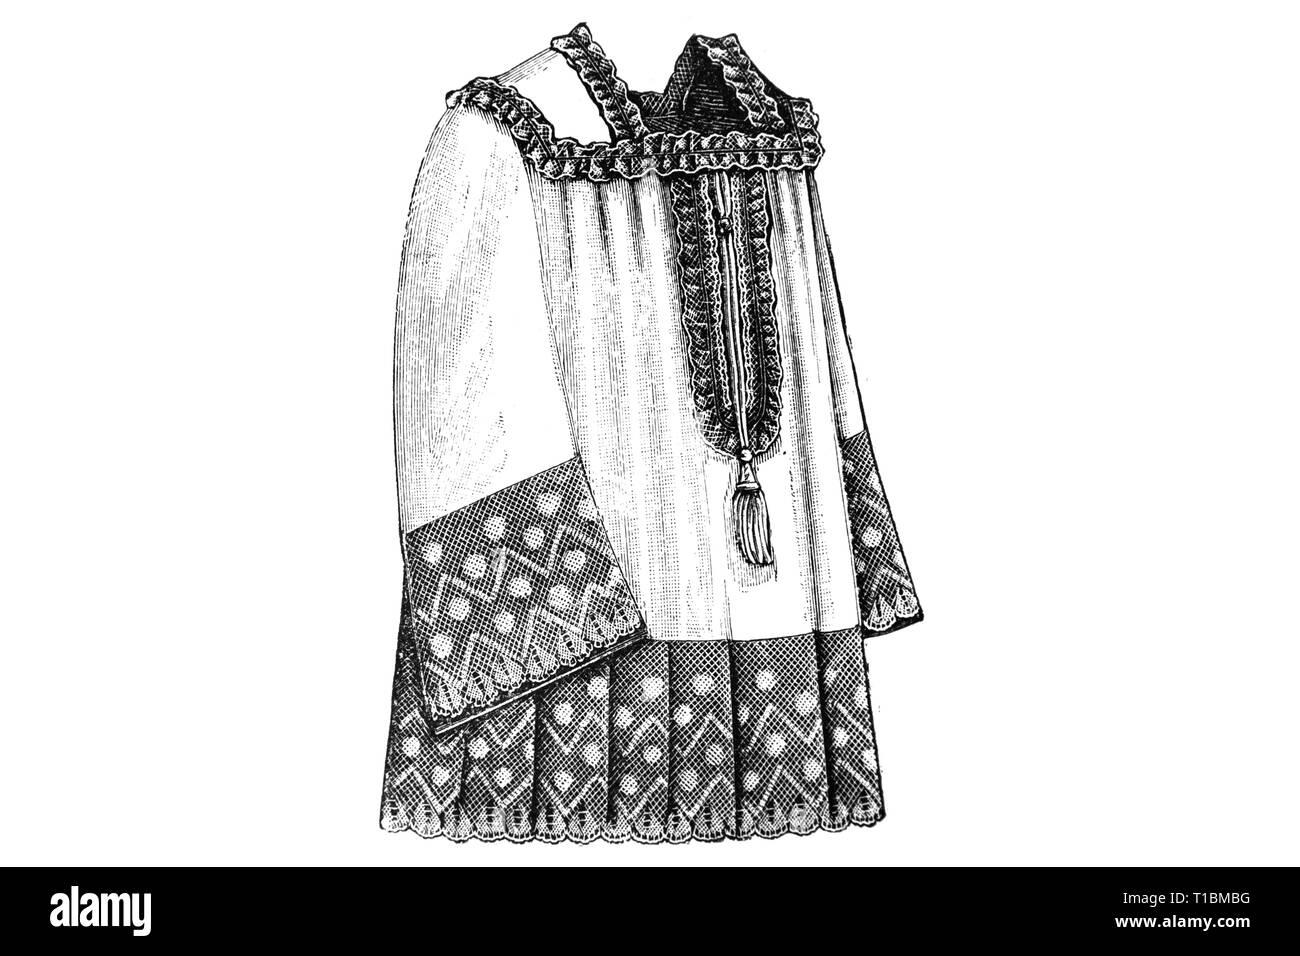 Gowns for Priests - Vintage Illustration 1905 - Stock Image